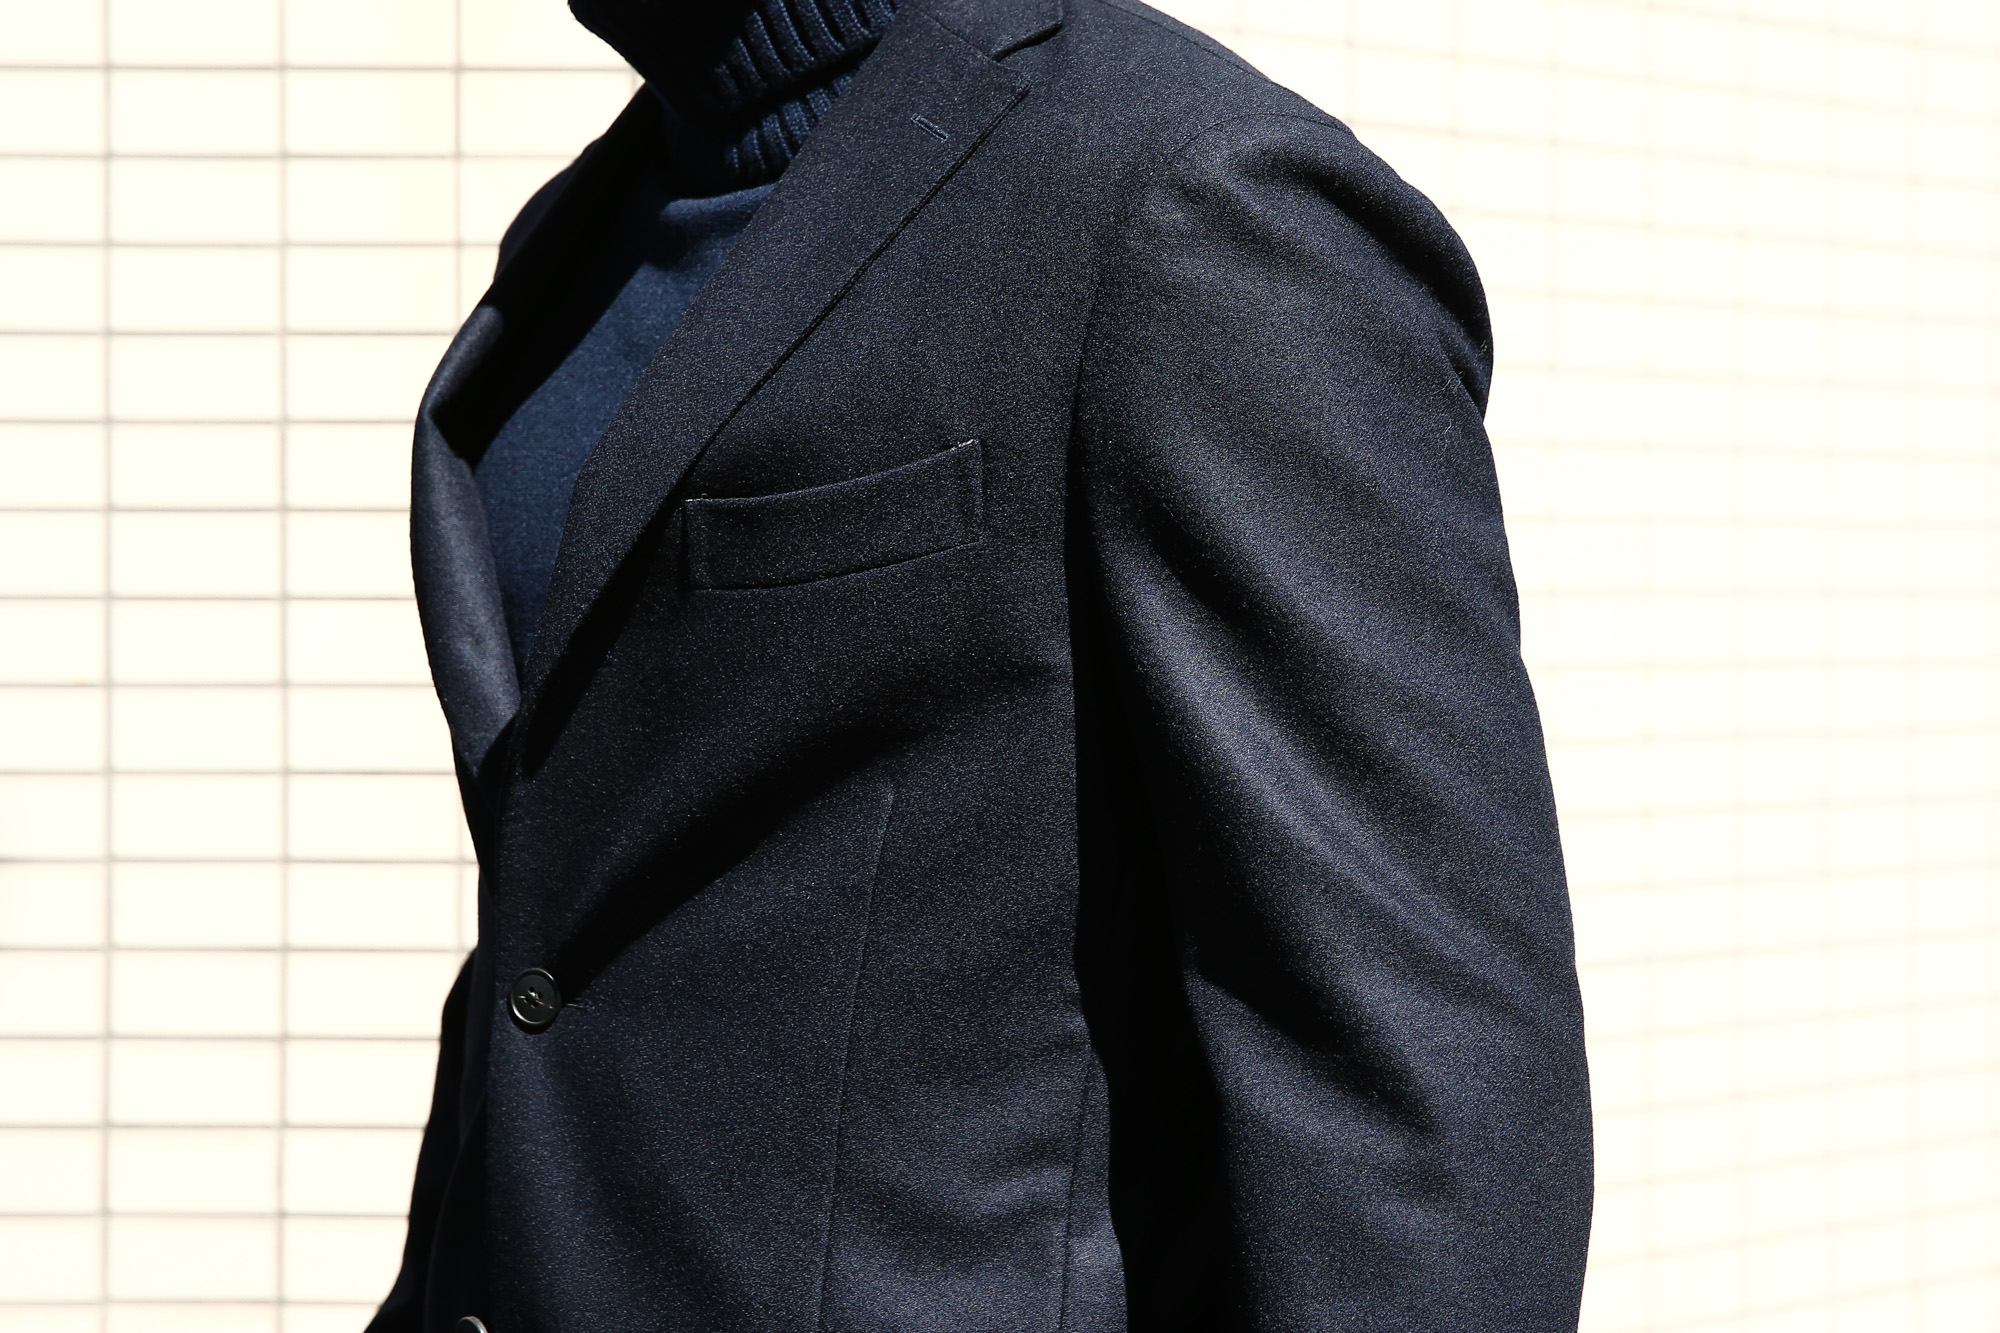 【BOGLIOLI MILANO / ボリオリ ミラノ】 K.JACKET (Kジャケット) フラノウール生地 アンコンジャケット 3Bジャケット NAVY (ネイビー・78) Made in italy (イタリア製) 2017 秋冬新作 bogliolimilano kjacket 愛知 名古屋 Alto e Diritto アルト エ デリット  42,44,46,48,50,52,54